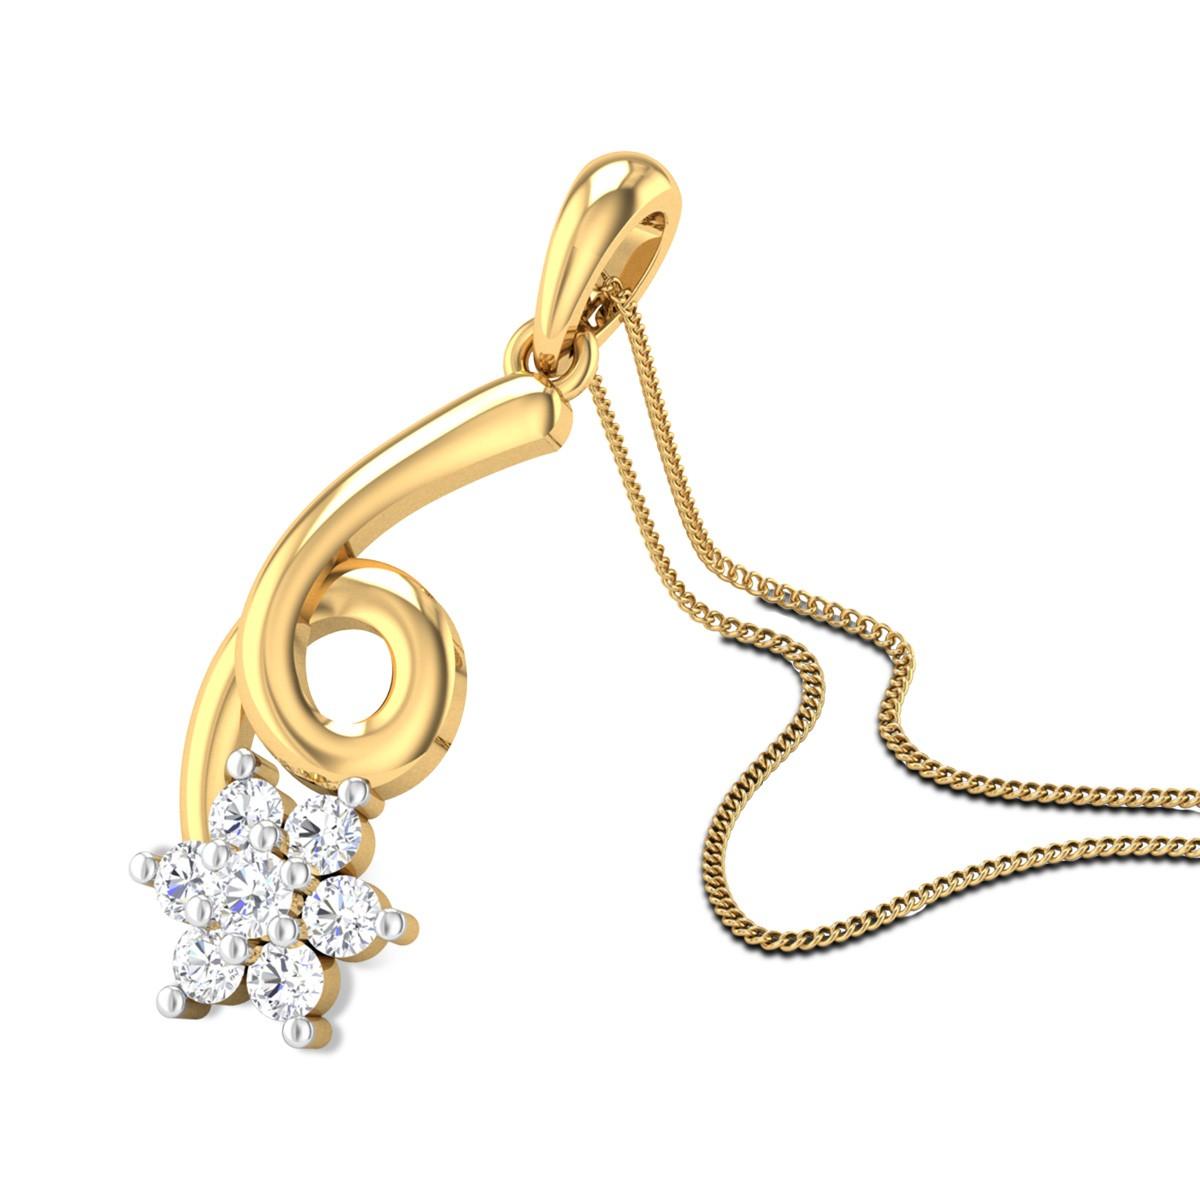 Queen of Hearts Diamond Pendant